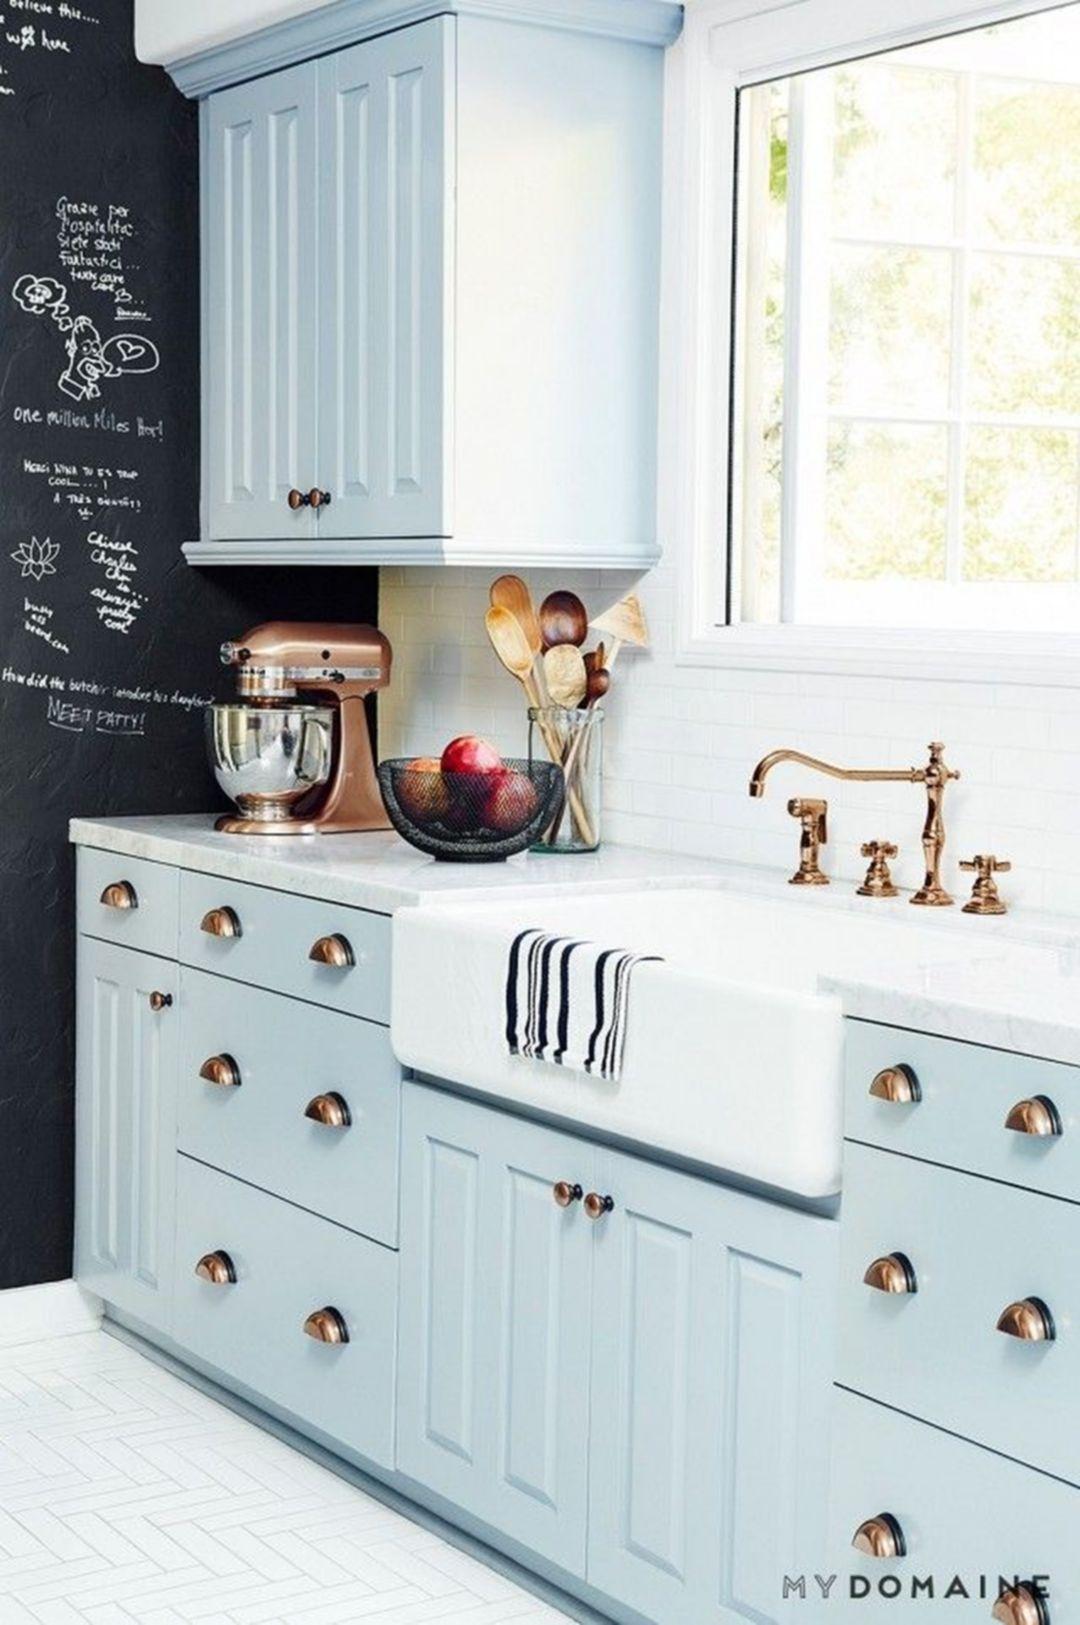 Gorgeous 30 Robins Egg Blue Kitchen Ideas For Beautiful Kitchen Color Schemes In 2020 Beautiful Kitchen Cabinets Best Kitchen Cabinets Kitchen Cabinet Colors